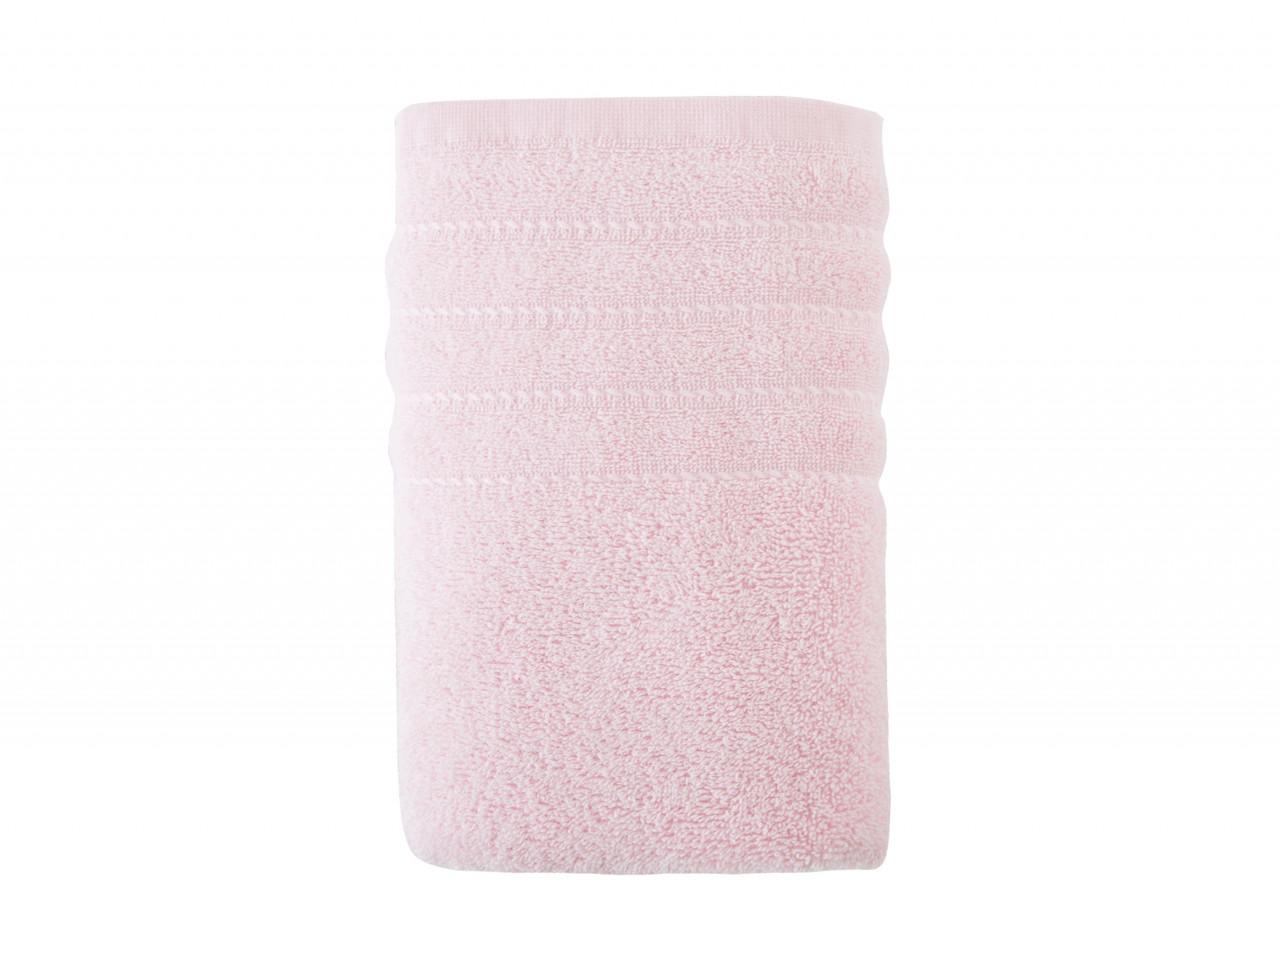 Рушник Irya - Alexa pembe рожевий 90*150